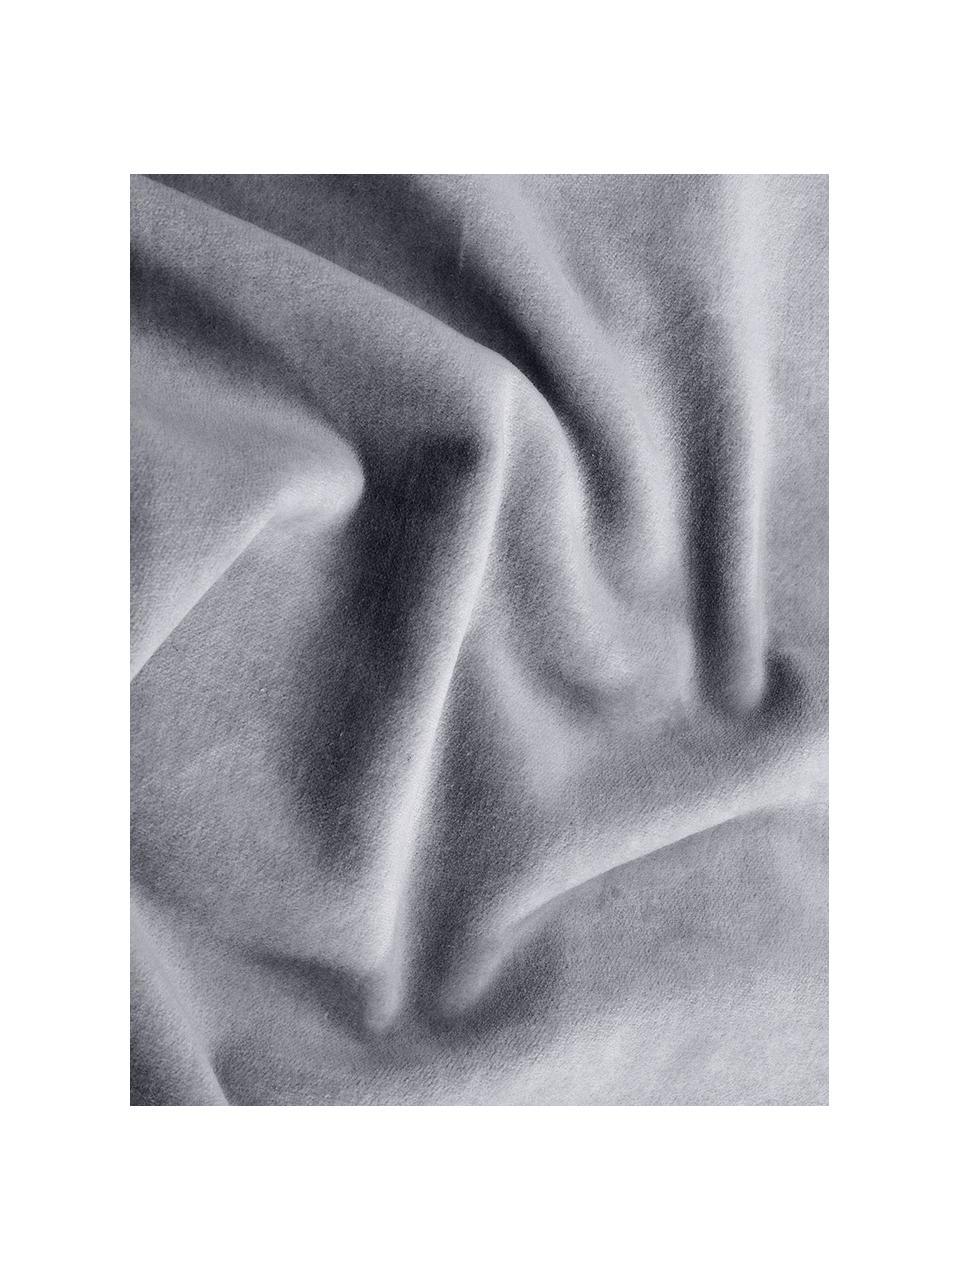 Einfarbige Samt-Kissenhülle Dana in Dunkelgrau, Baumwollsamt, Dunkelgrau, 40 x 40 cm